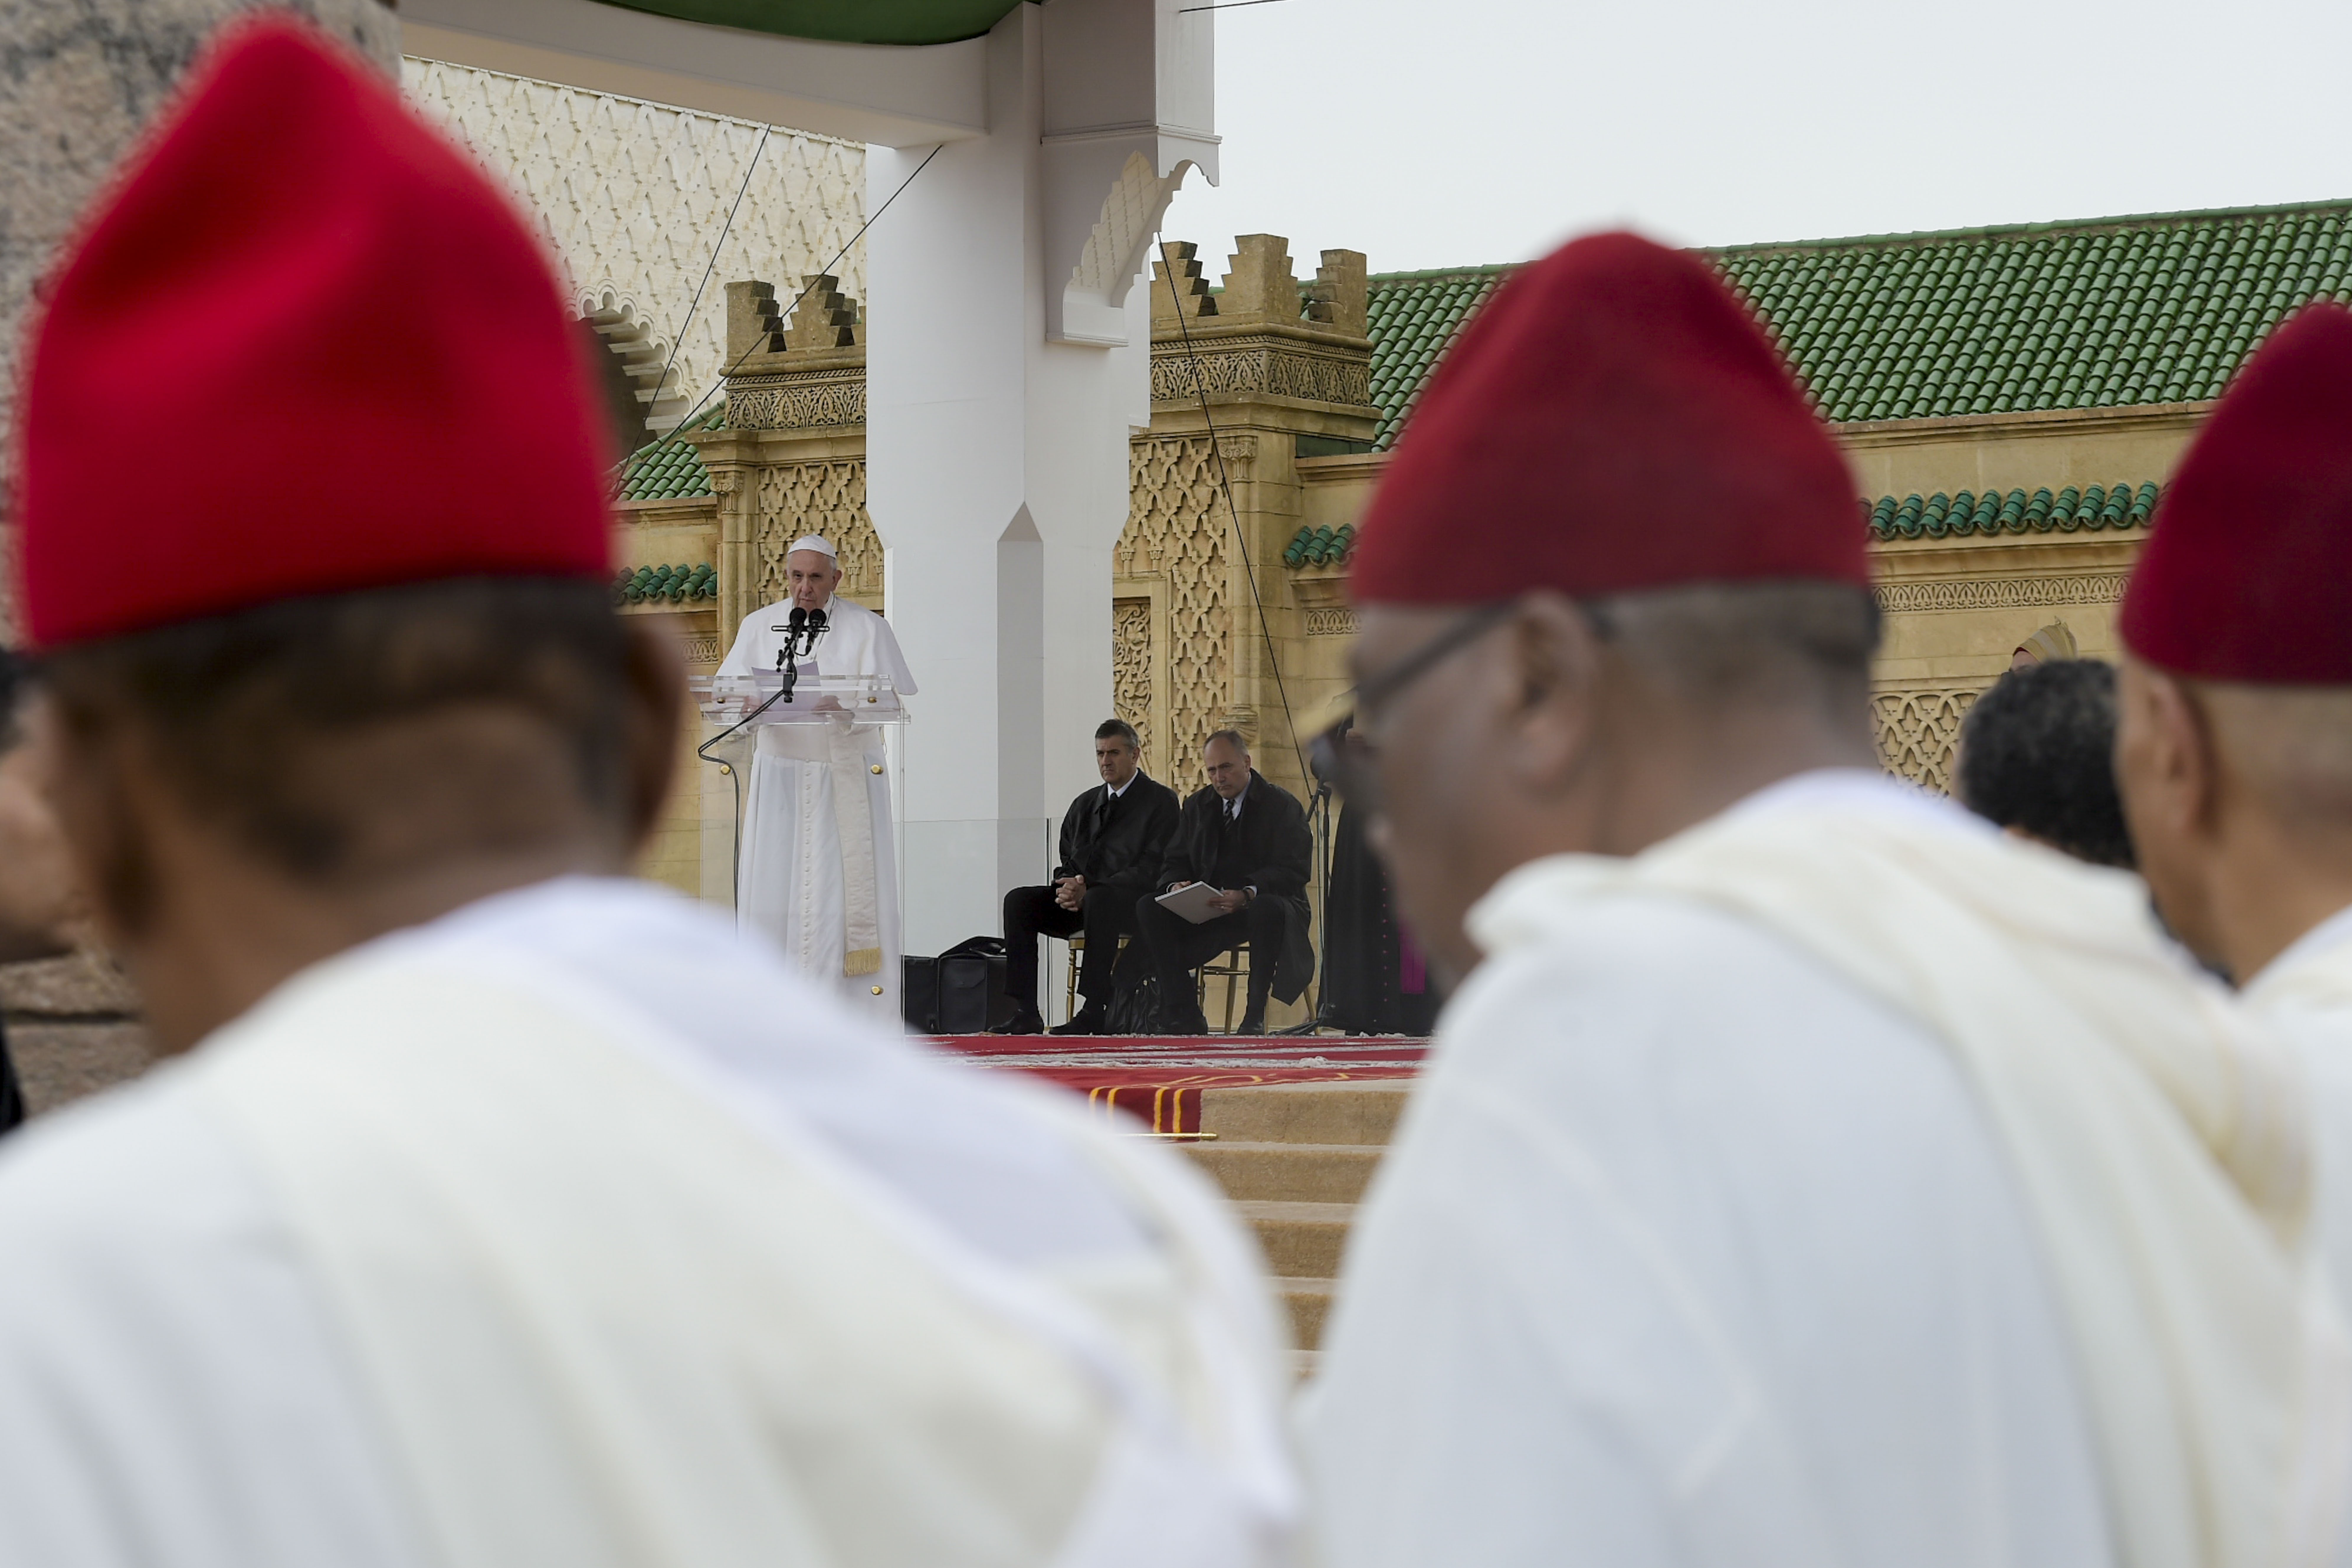 Discurso del Papa a las autoridades marroquíes en Rabat © Vatican Media